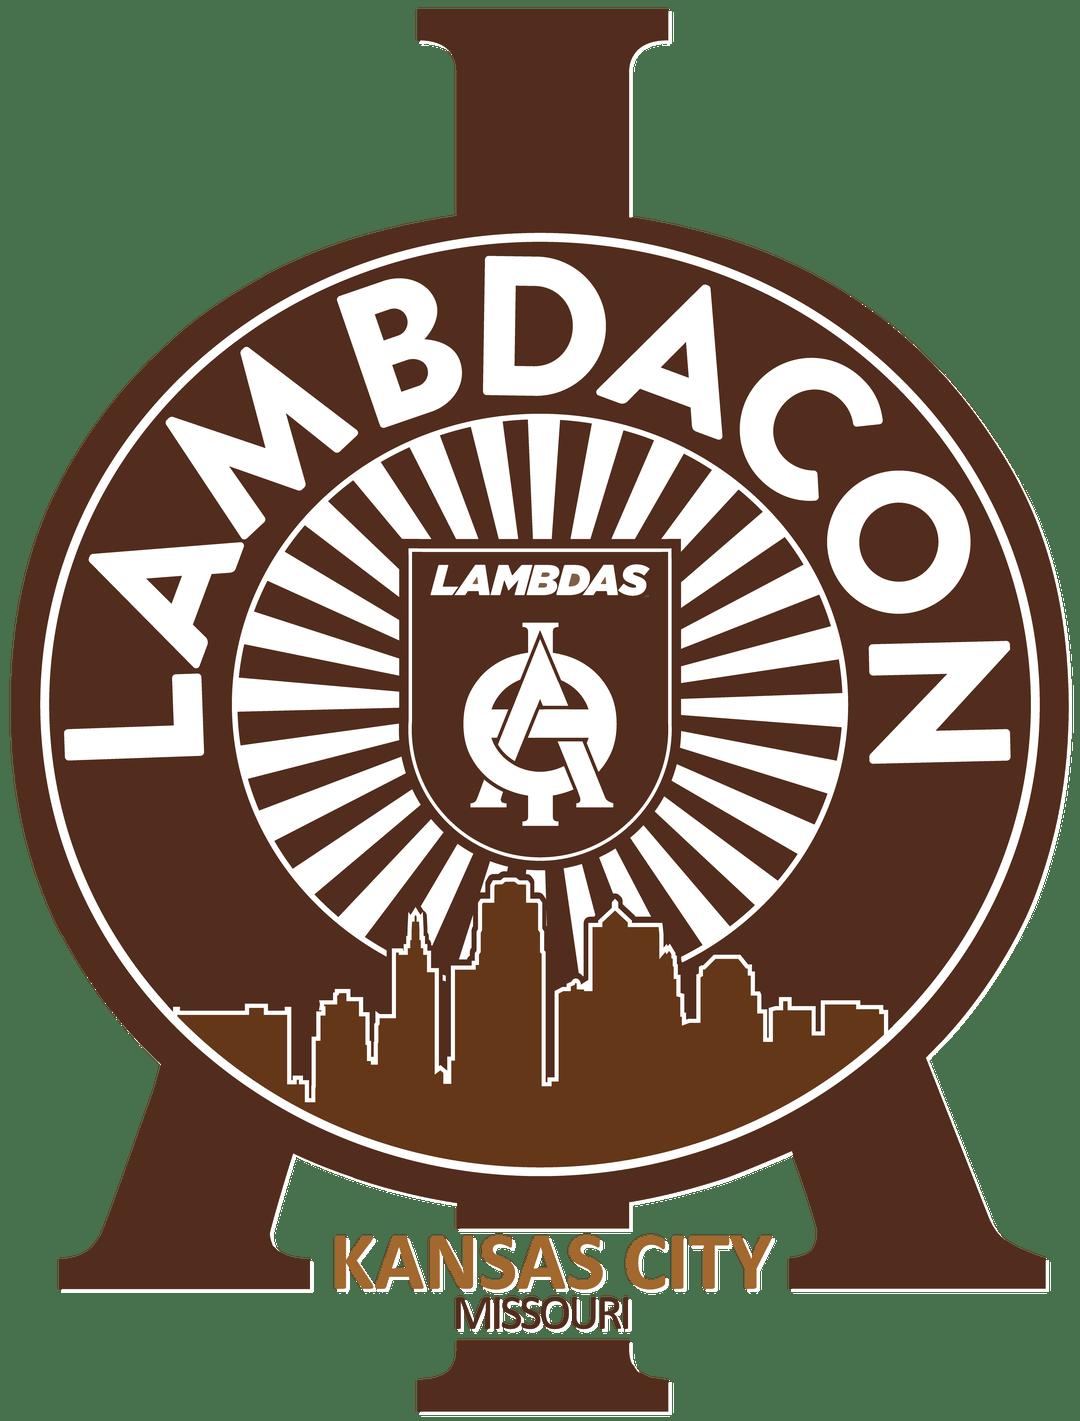 Kansas city royals crown logo clipart clip art freeuse library LambdaCon 2018 | Kansas City, MO | Lambda Theta Phi Latin Fraternity ... clip art freeuse library